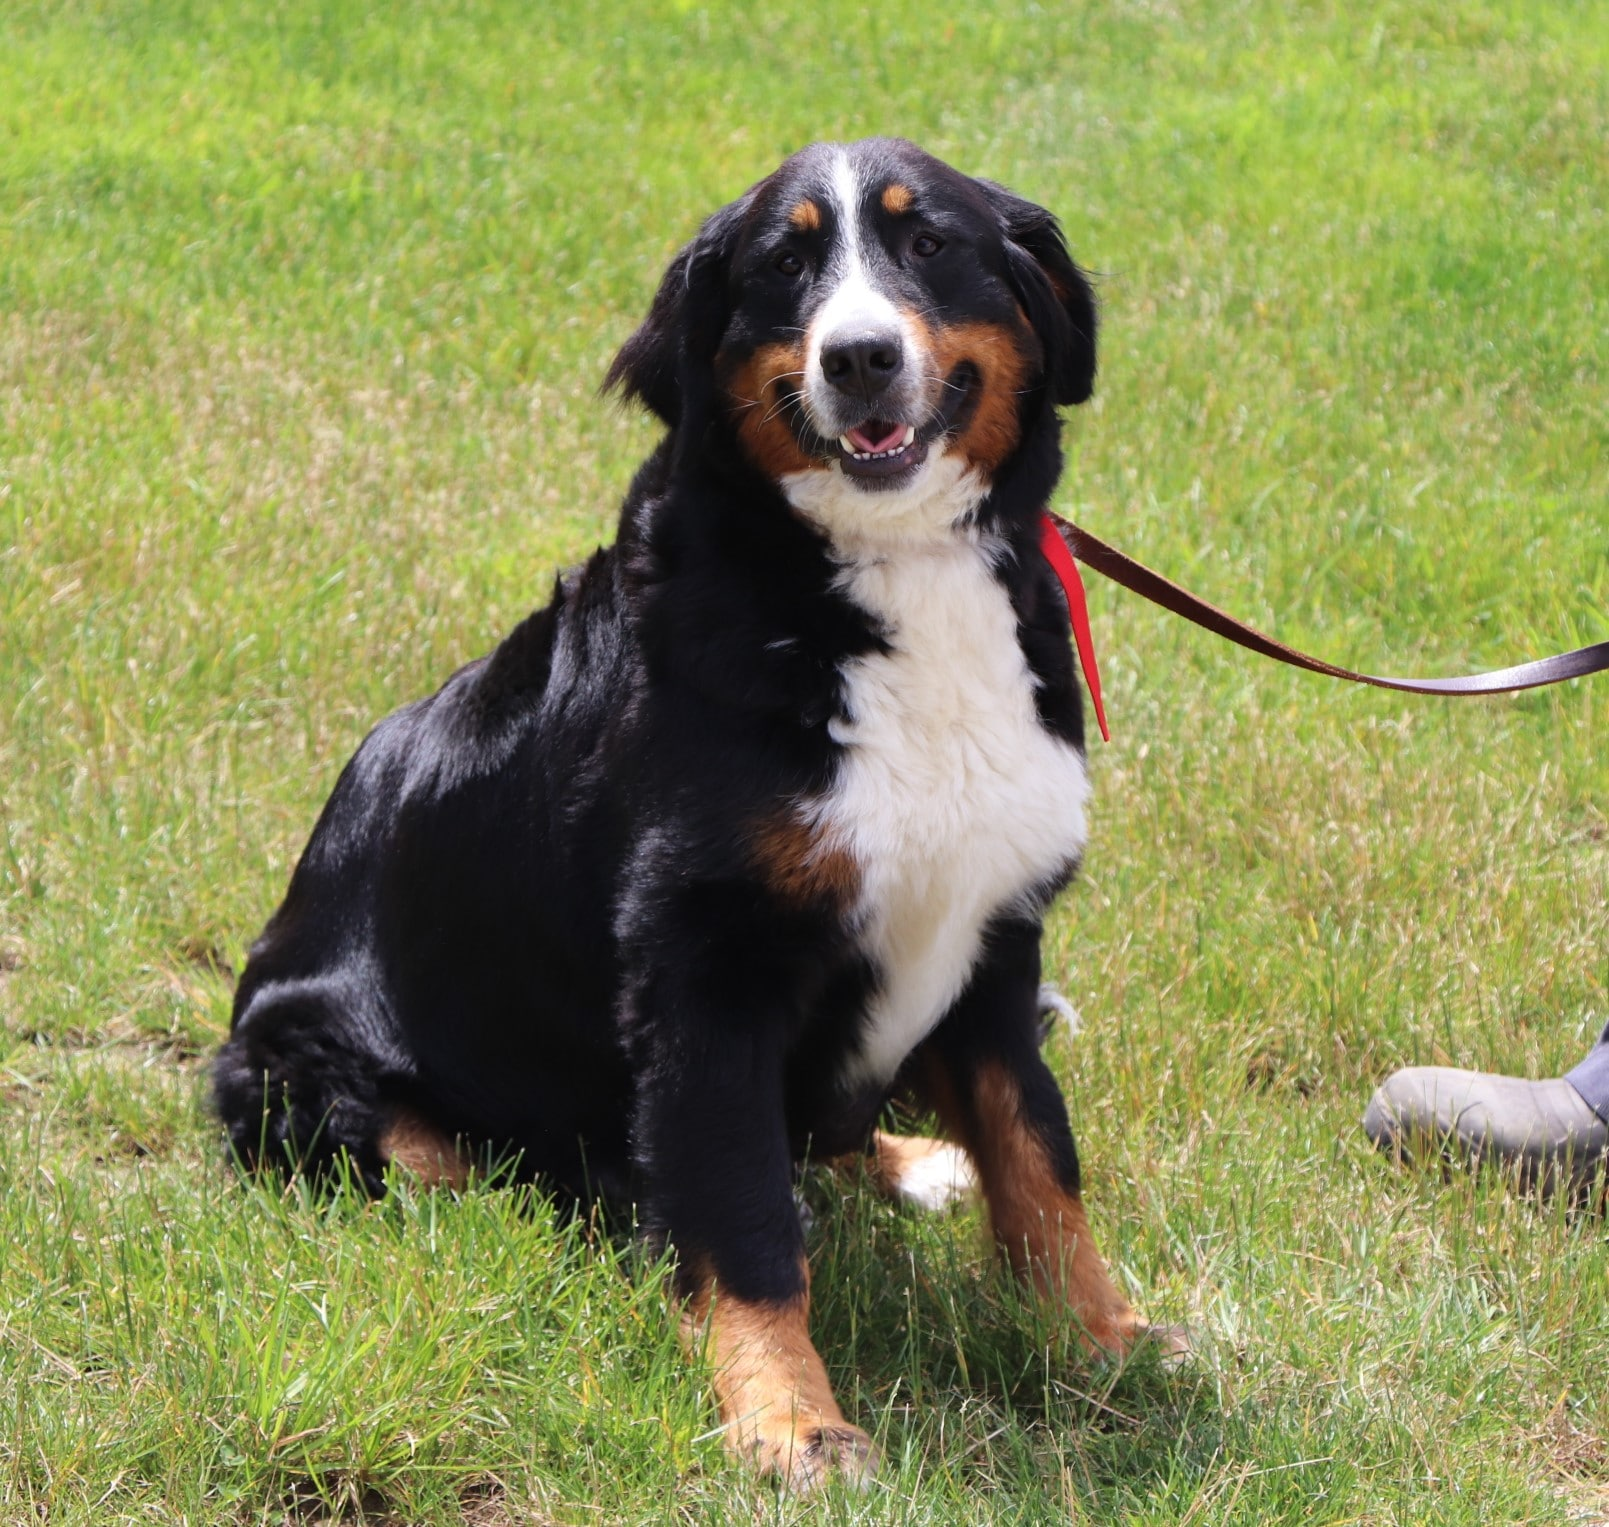 Roxie, the Bernese Mountain Dog mom